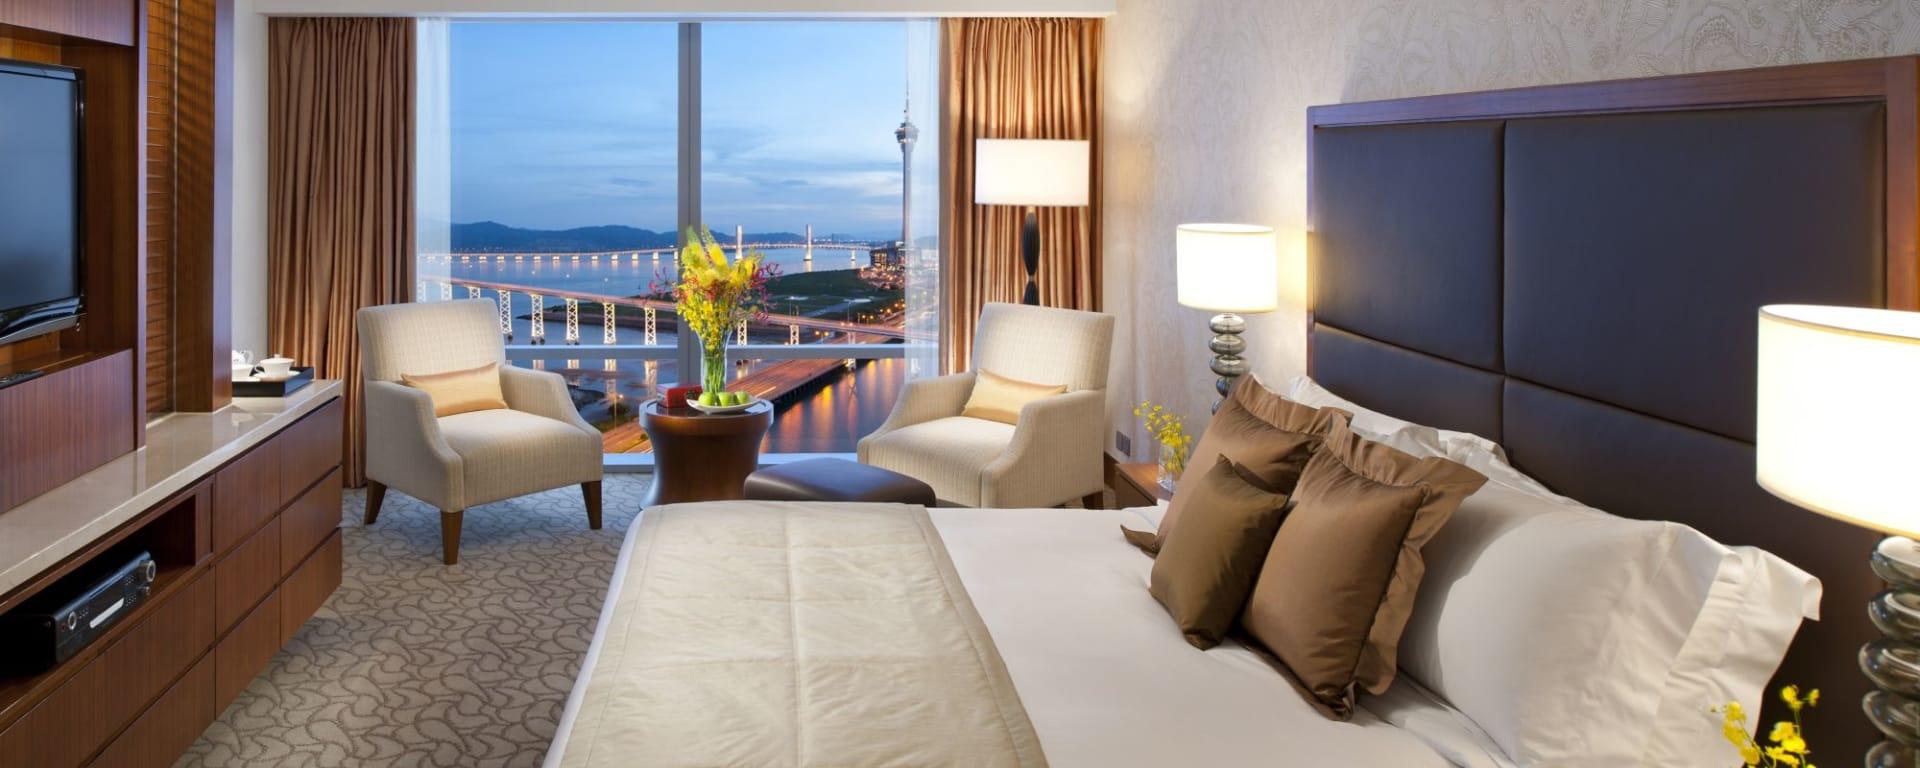 Mandarin Oriental Macau à Macao: Deluxe Lake View